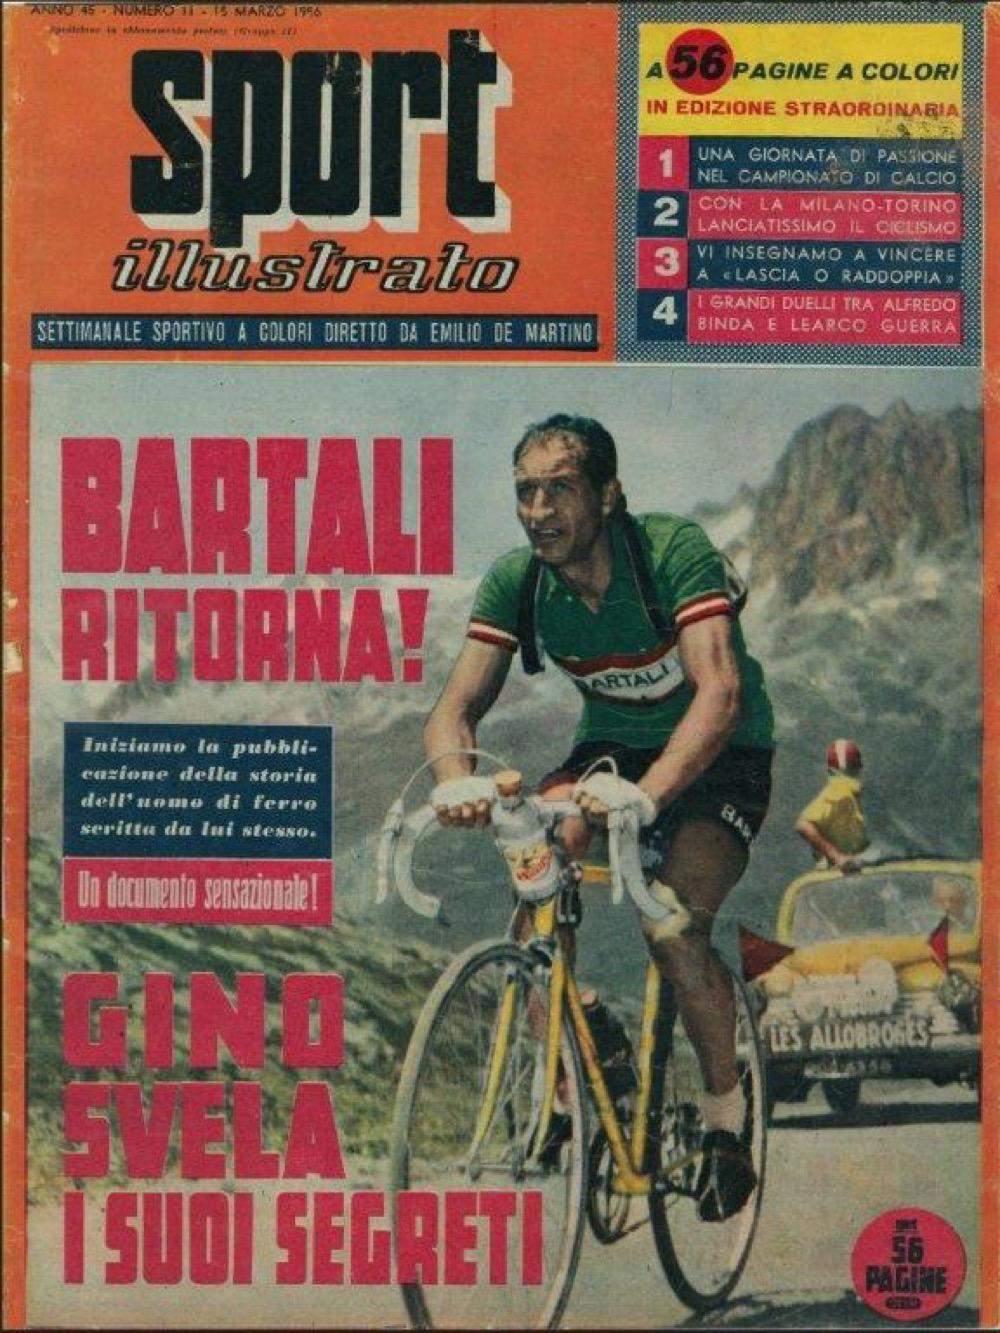 5.ciclismo-eroica-manifesto-nel-caffè.jpg